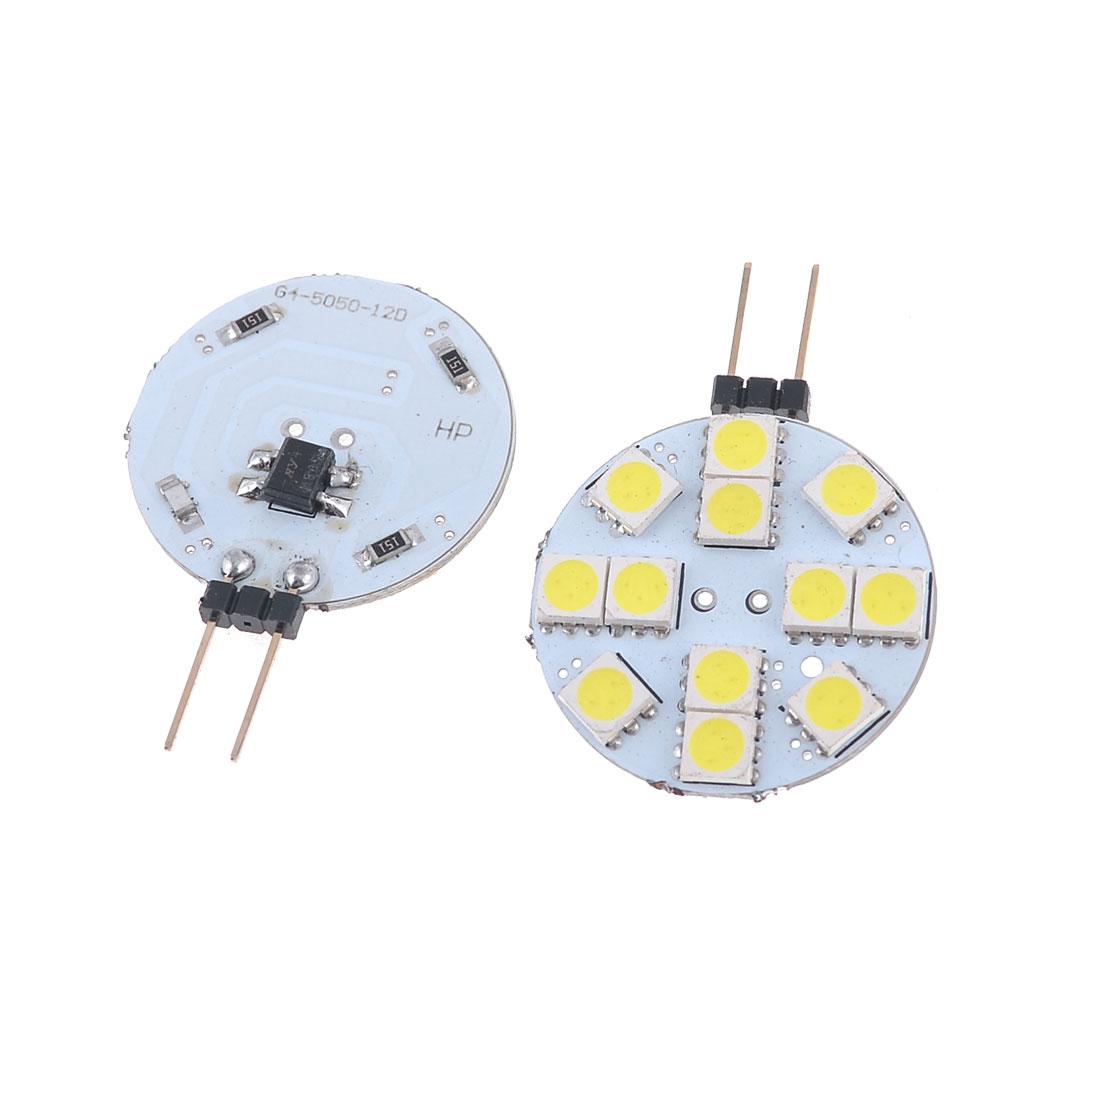 2 Pcs Side Pin G4 Round Base White 5050 SMD 12 LED Dome Bulb Light 12V